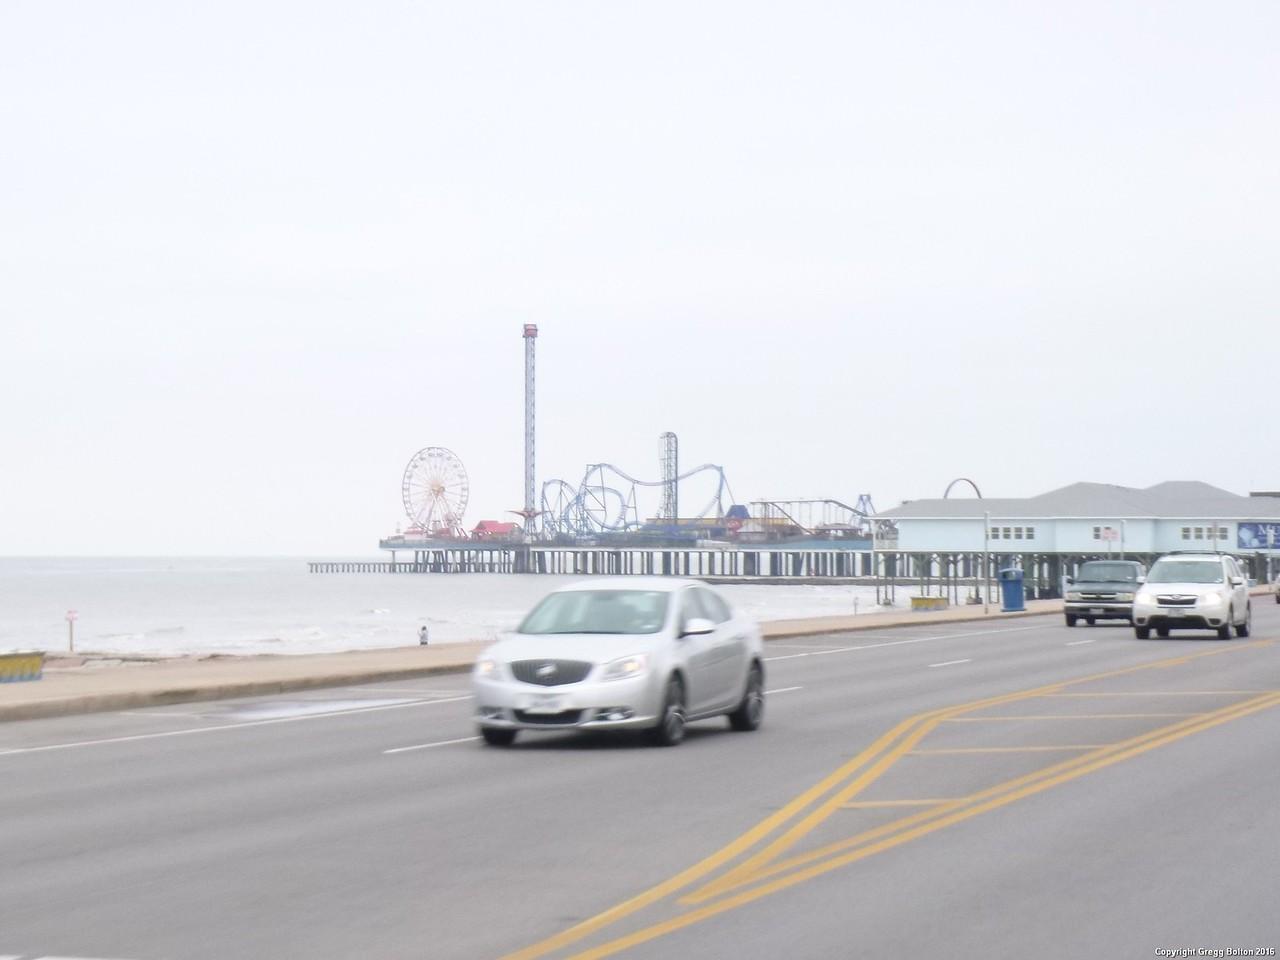 Galveston Amusement pier